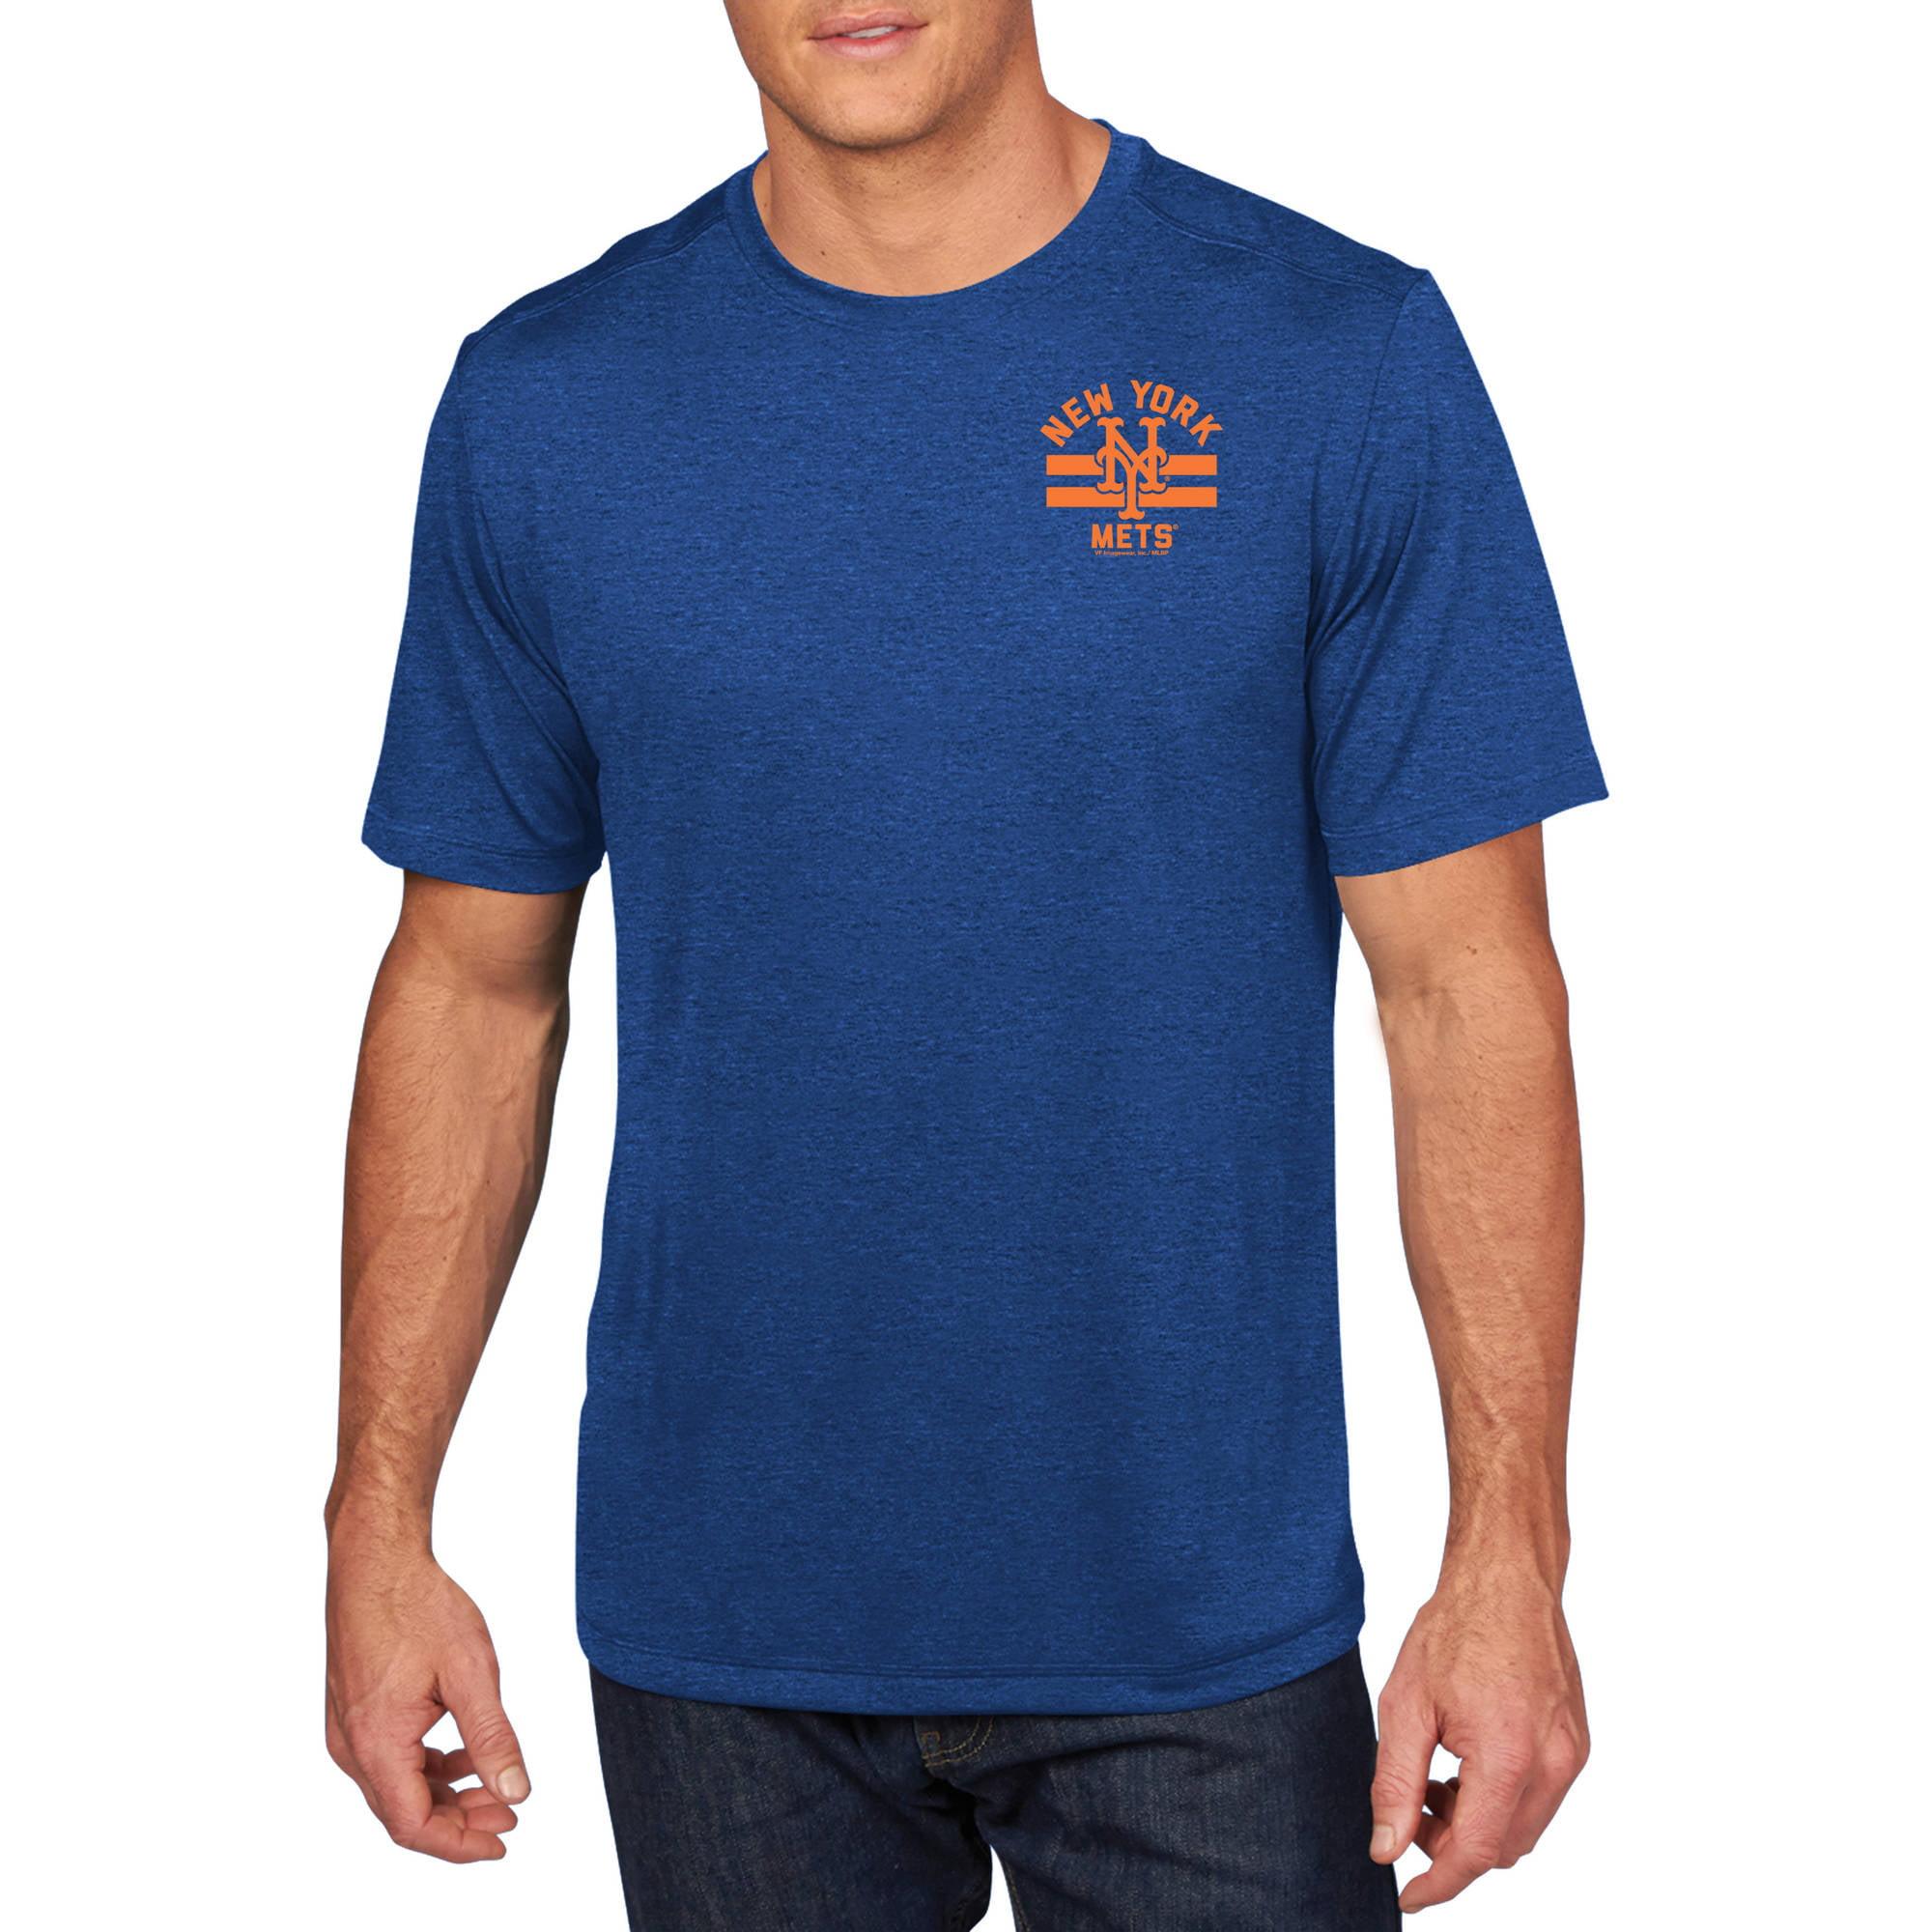 MLB - Big Mens New York Mets Short Sleeve Synthetic Team Tee